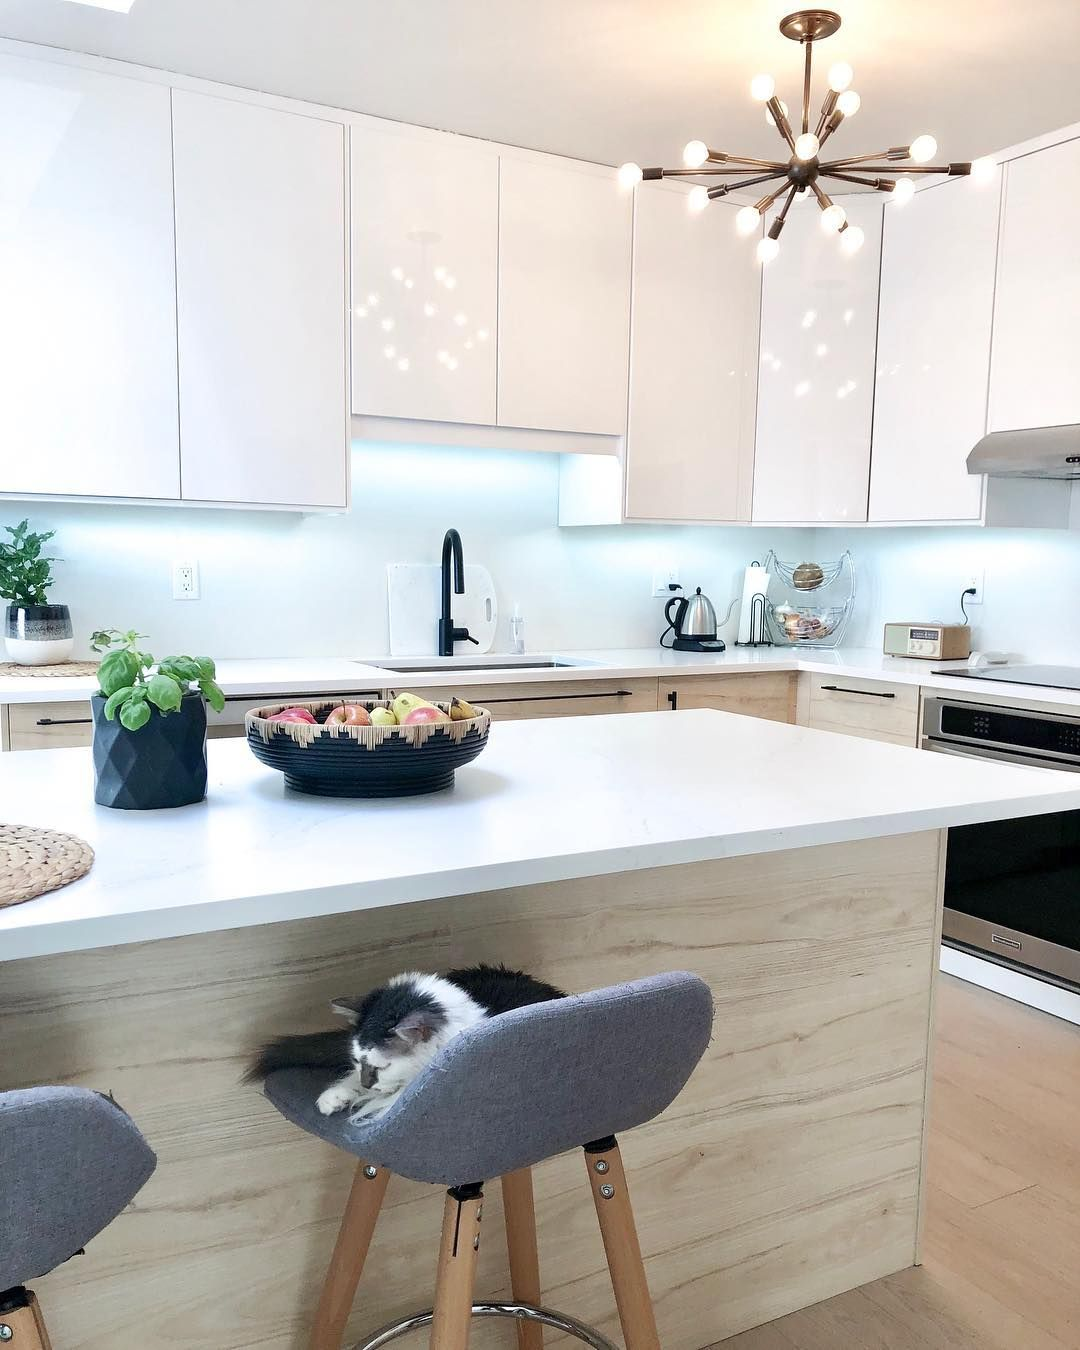 Download Wallpaper Used White Kitchen Units